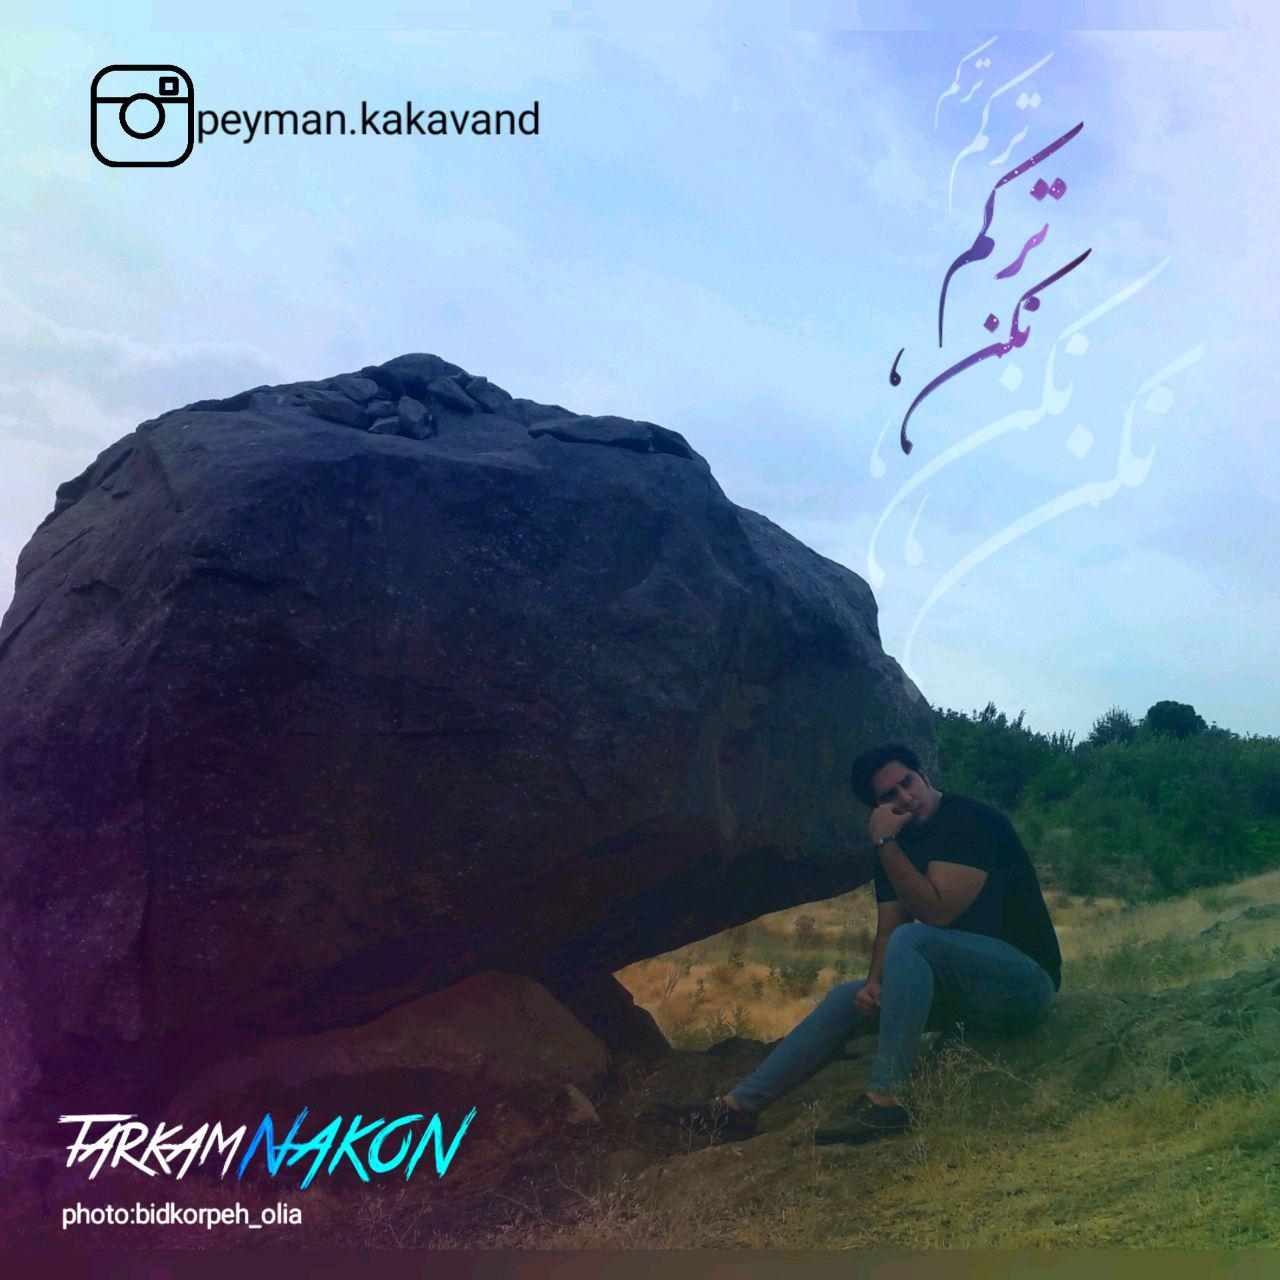 Peyman Kakavand – Tarkam Nakon